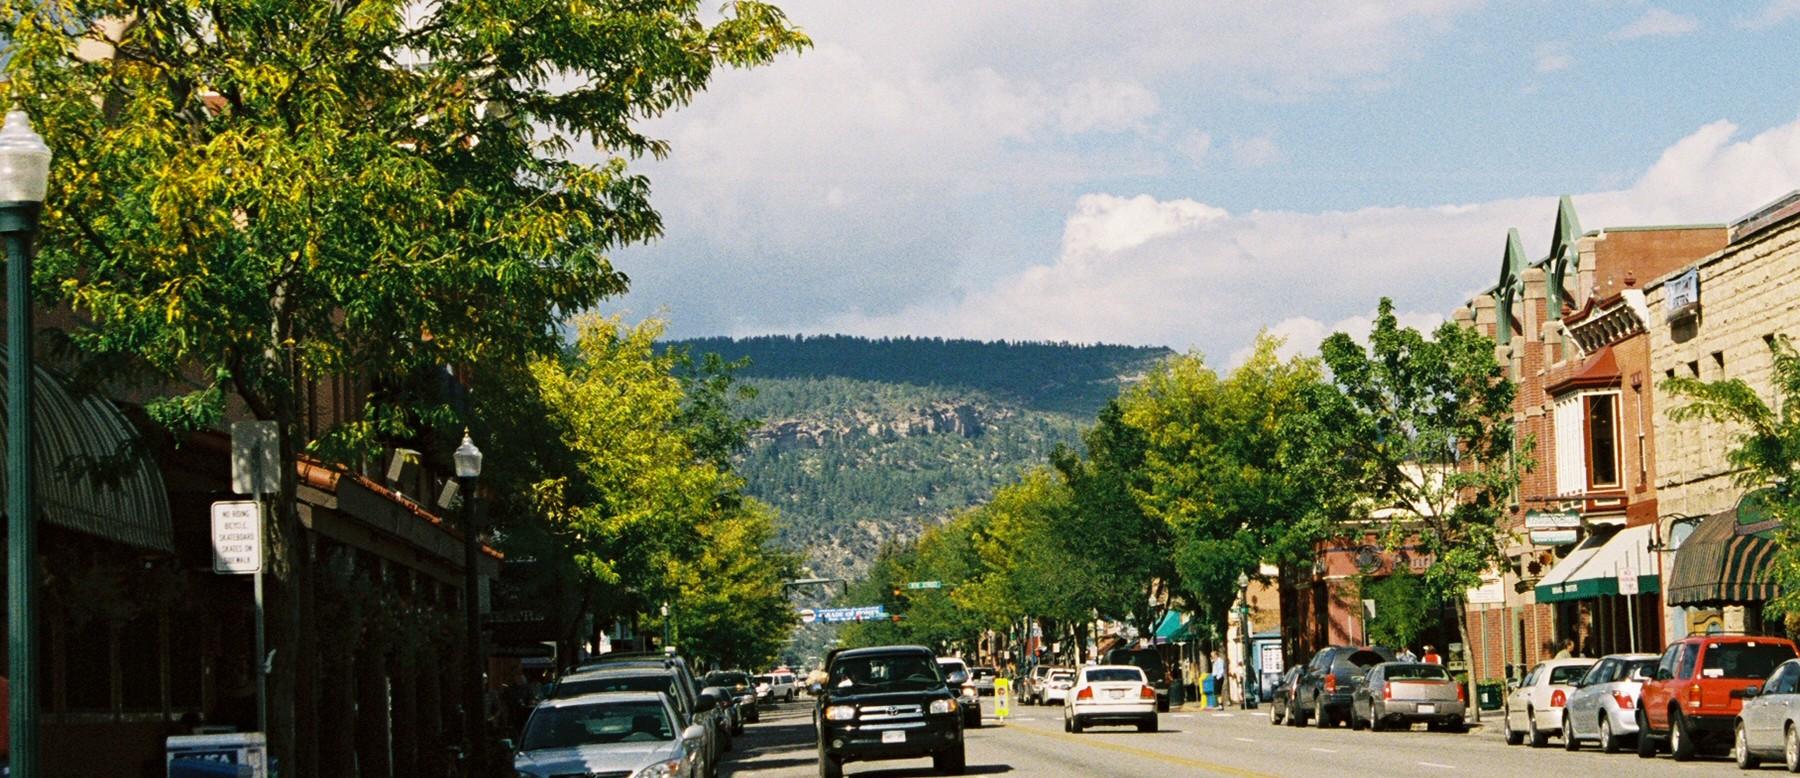 Top Things To Do In Historic Downtown Durango Durango Com